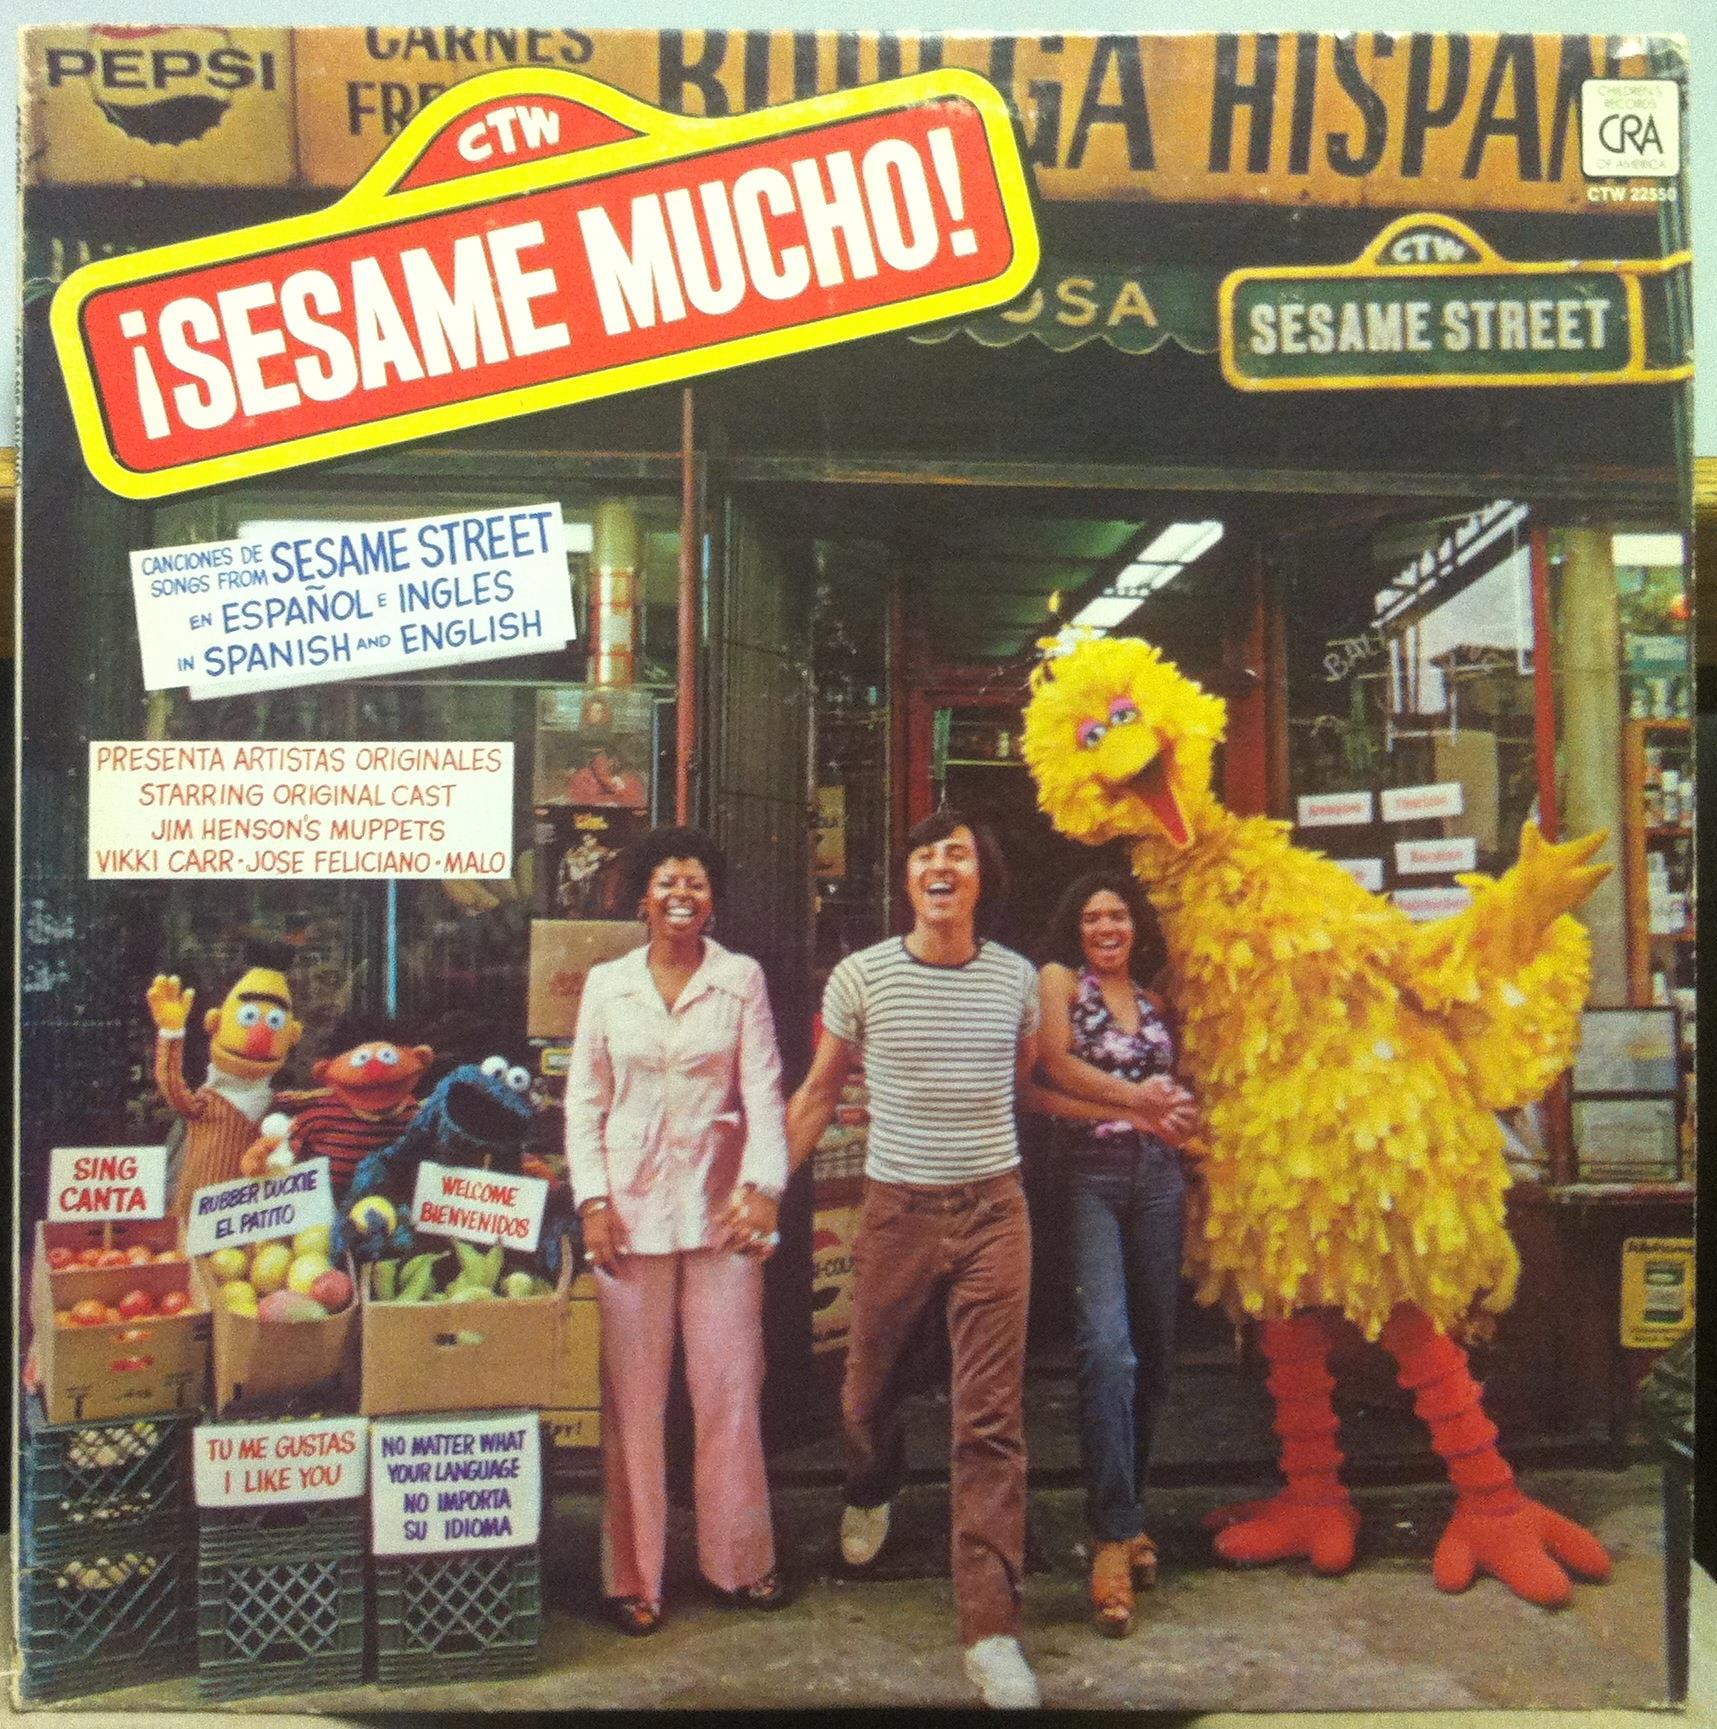 SESAME STREET LATIN ALBUM - Sesame Mucho